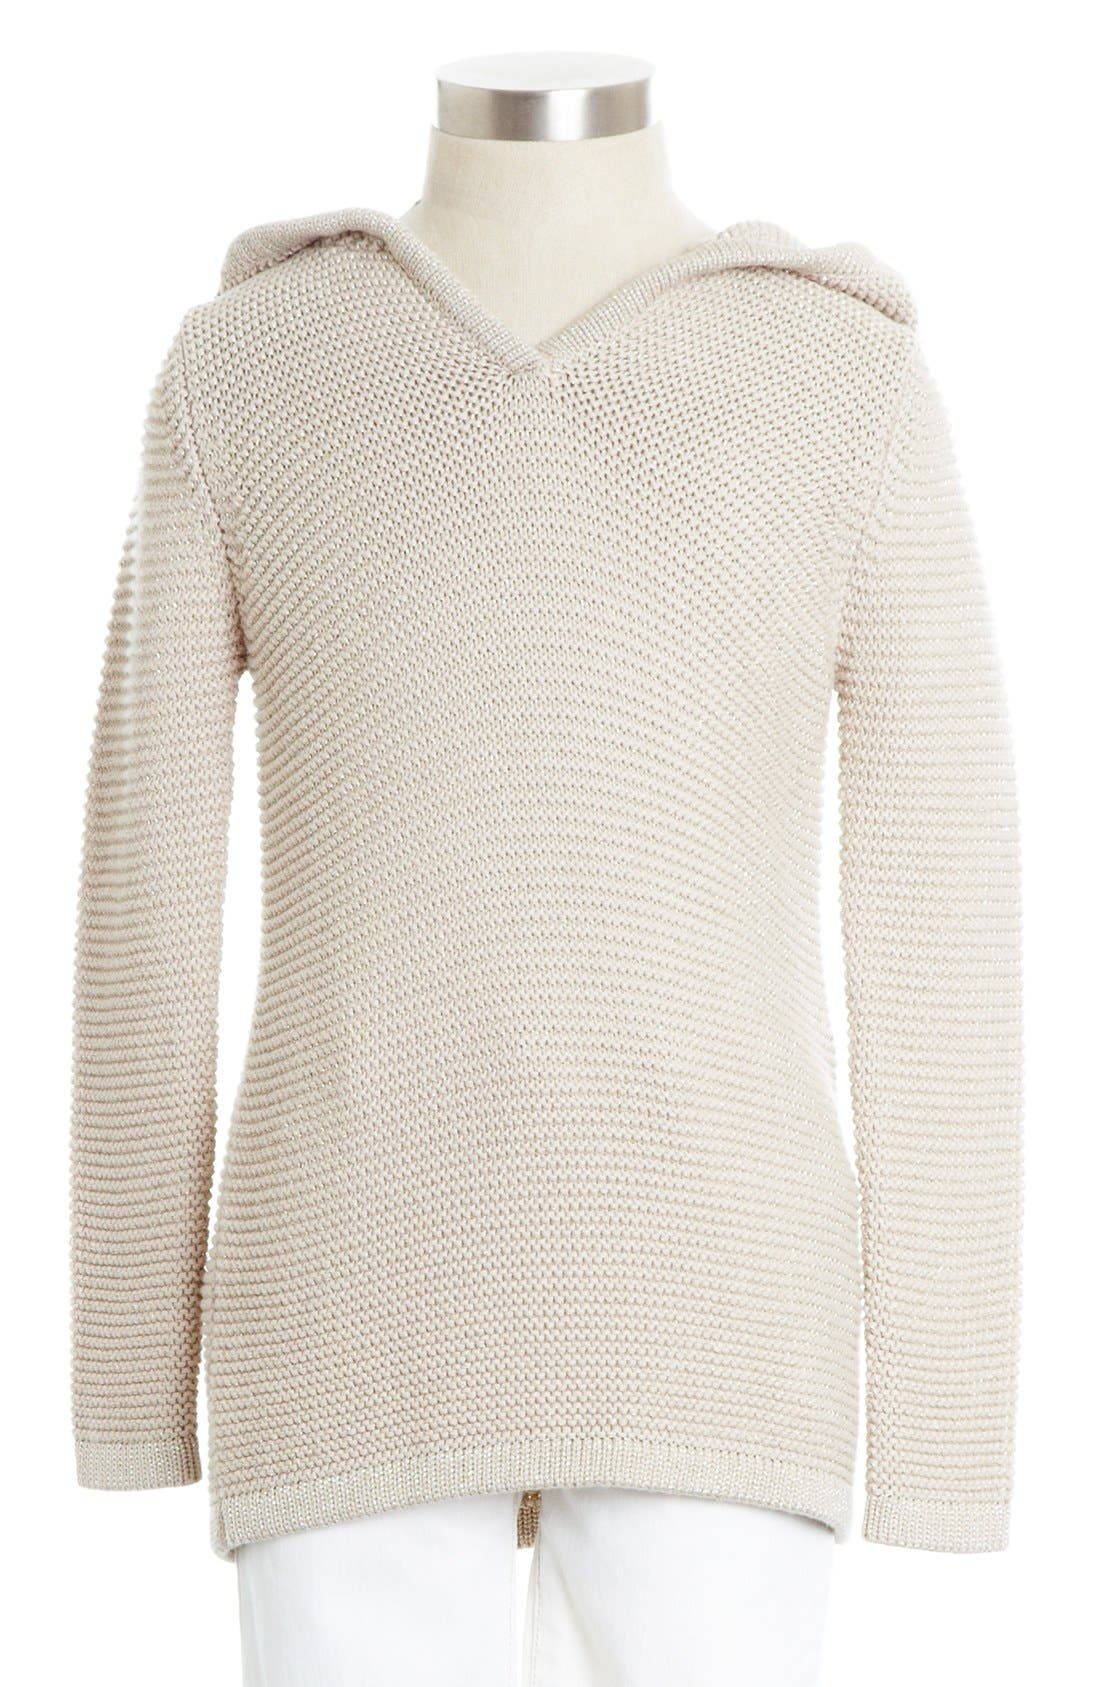 Main Image - Peek 'Becca' Hooded Sweater (Toddler Girls, Little Girls & Big Girls)